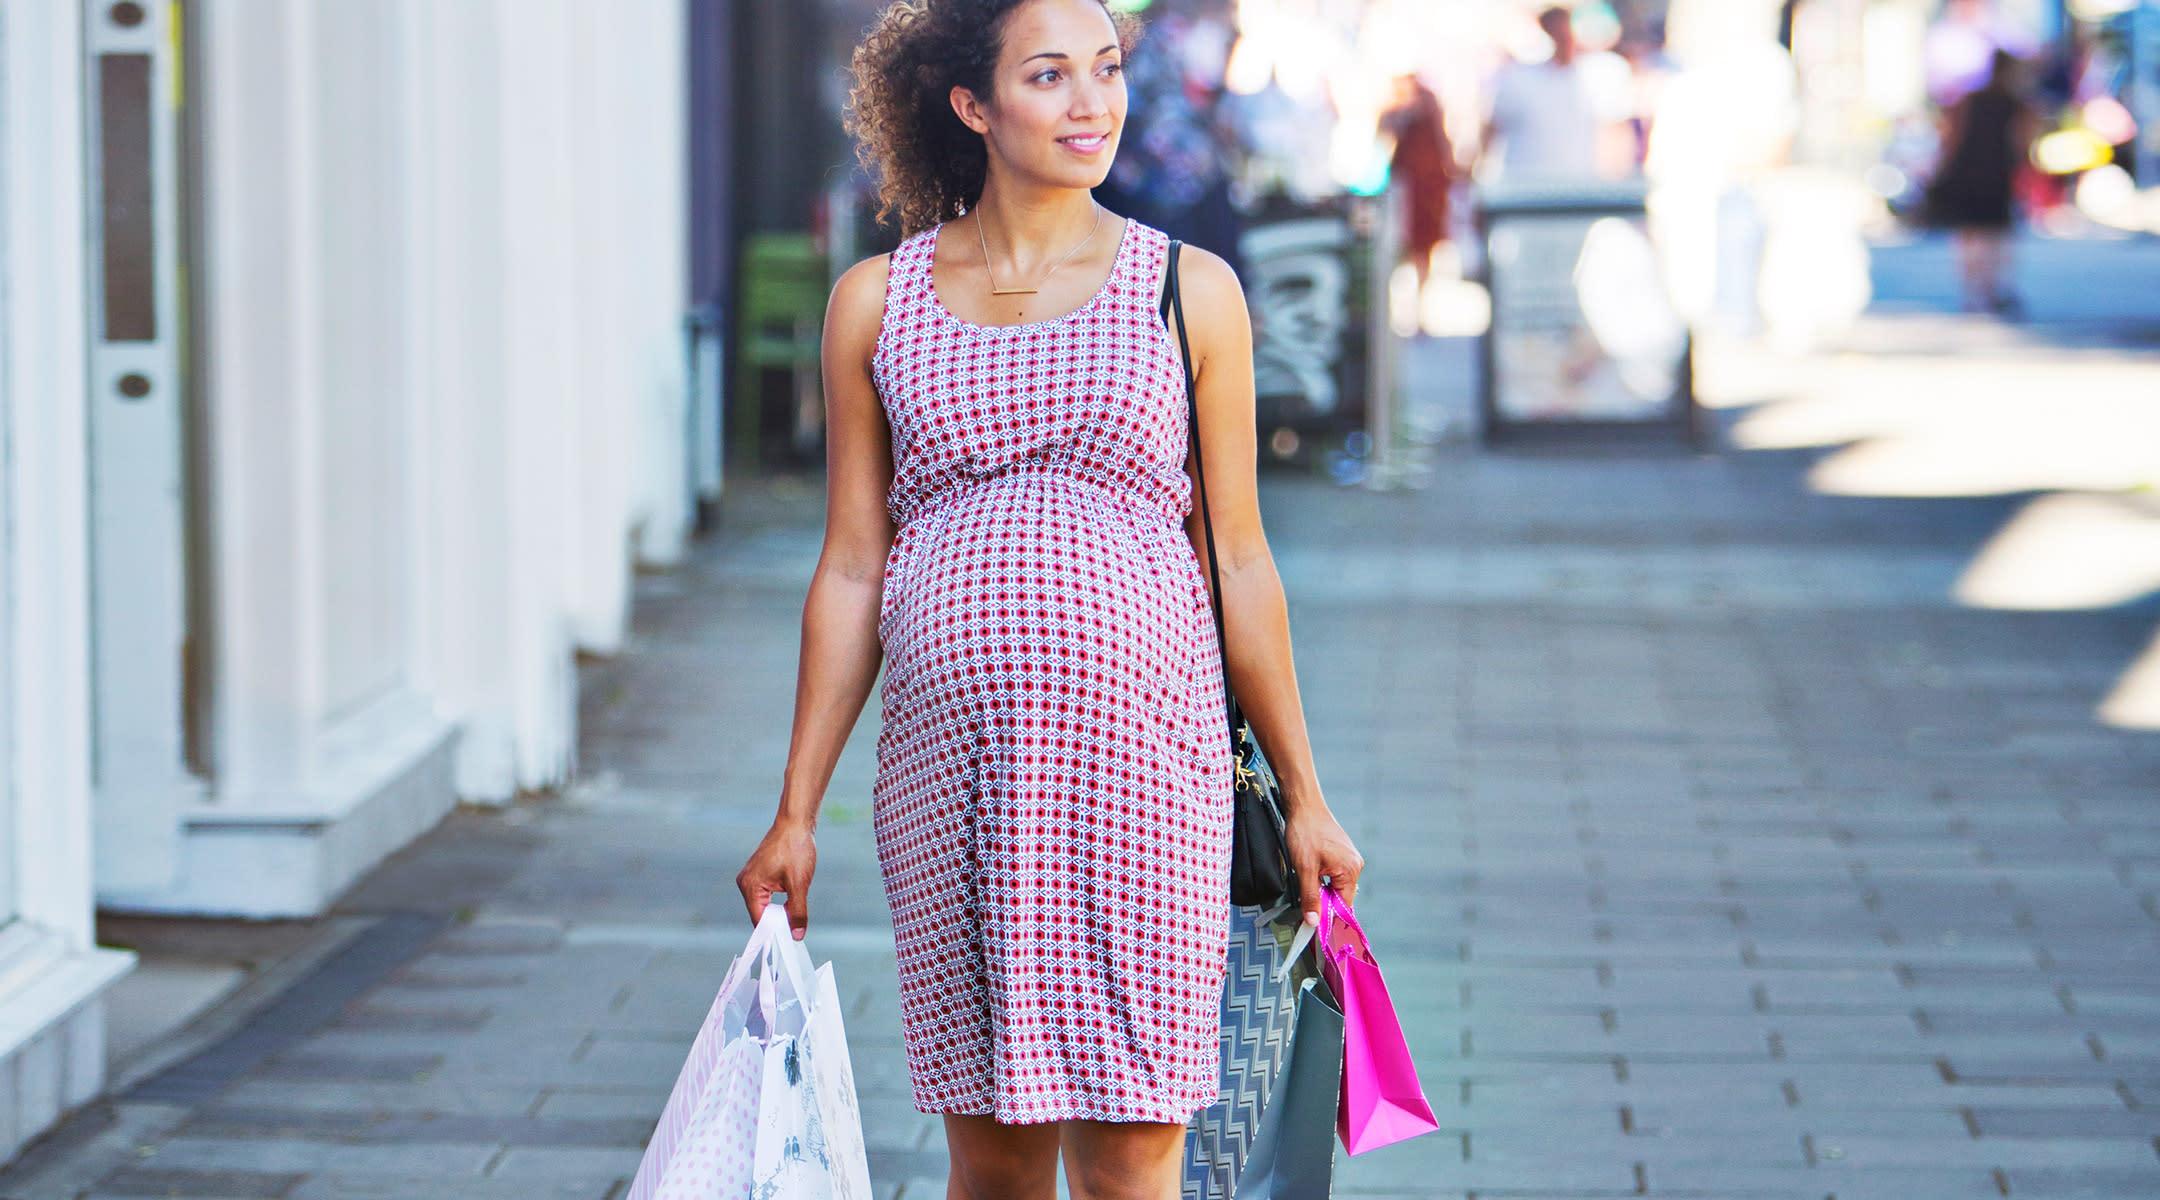 pregnant woman walking shopping maternity fashion